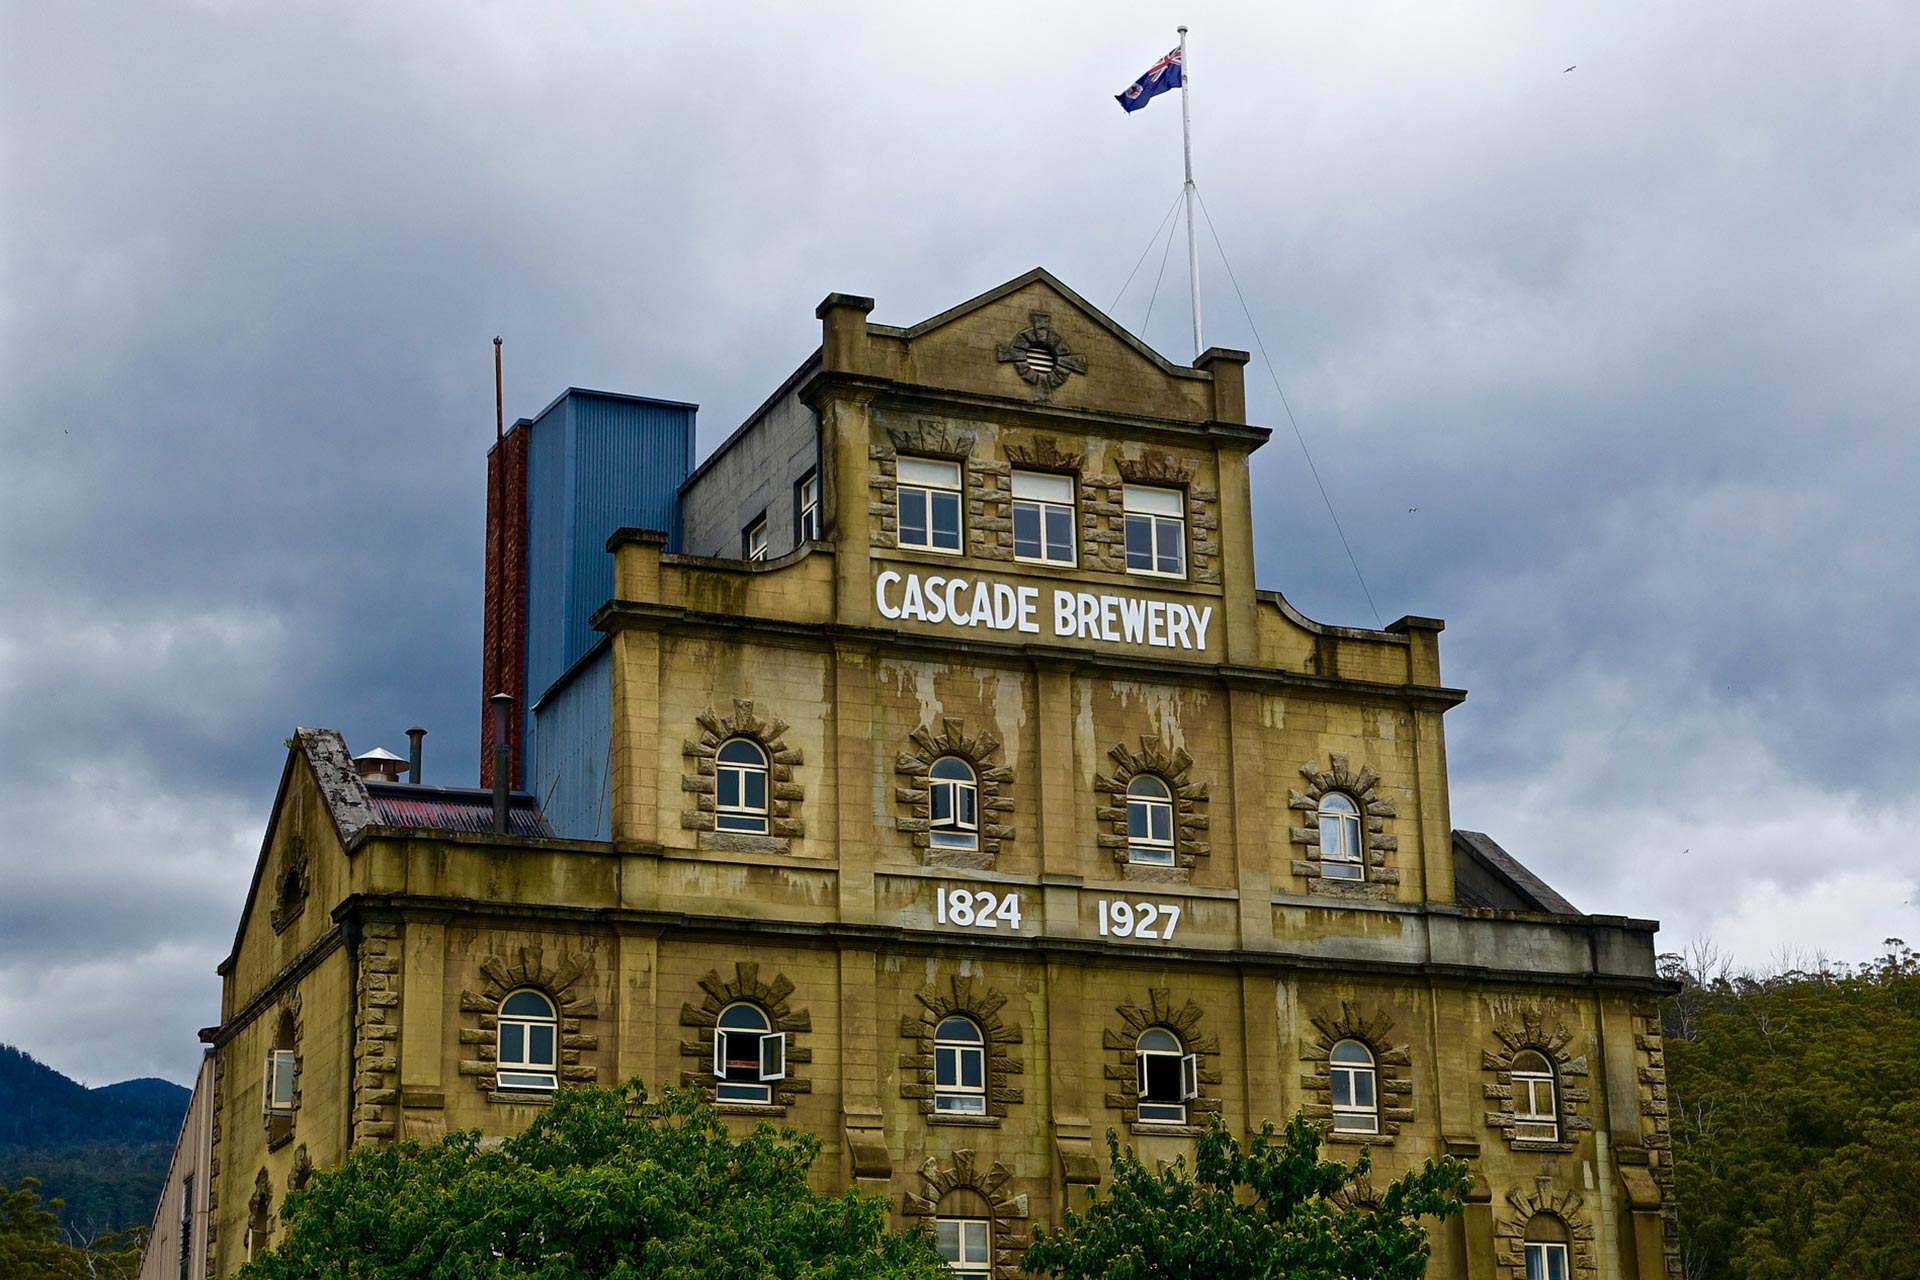 Cascade Brewery, Hobart, Tasmania - Australia's oldest brewery